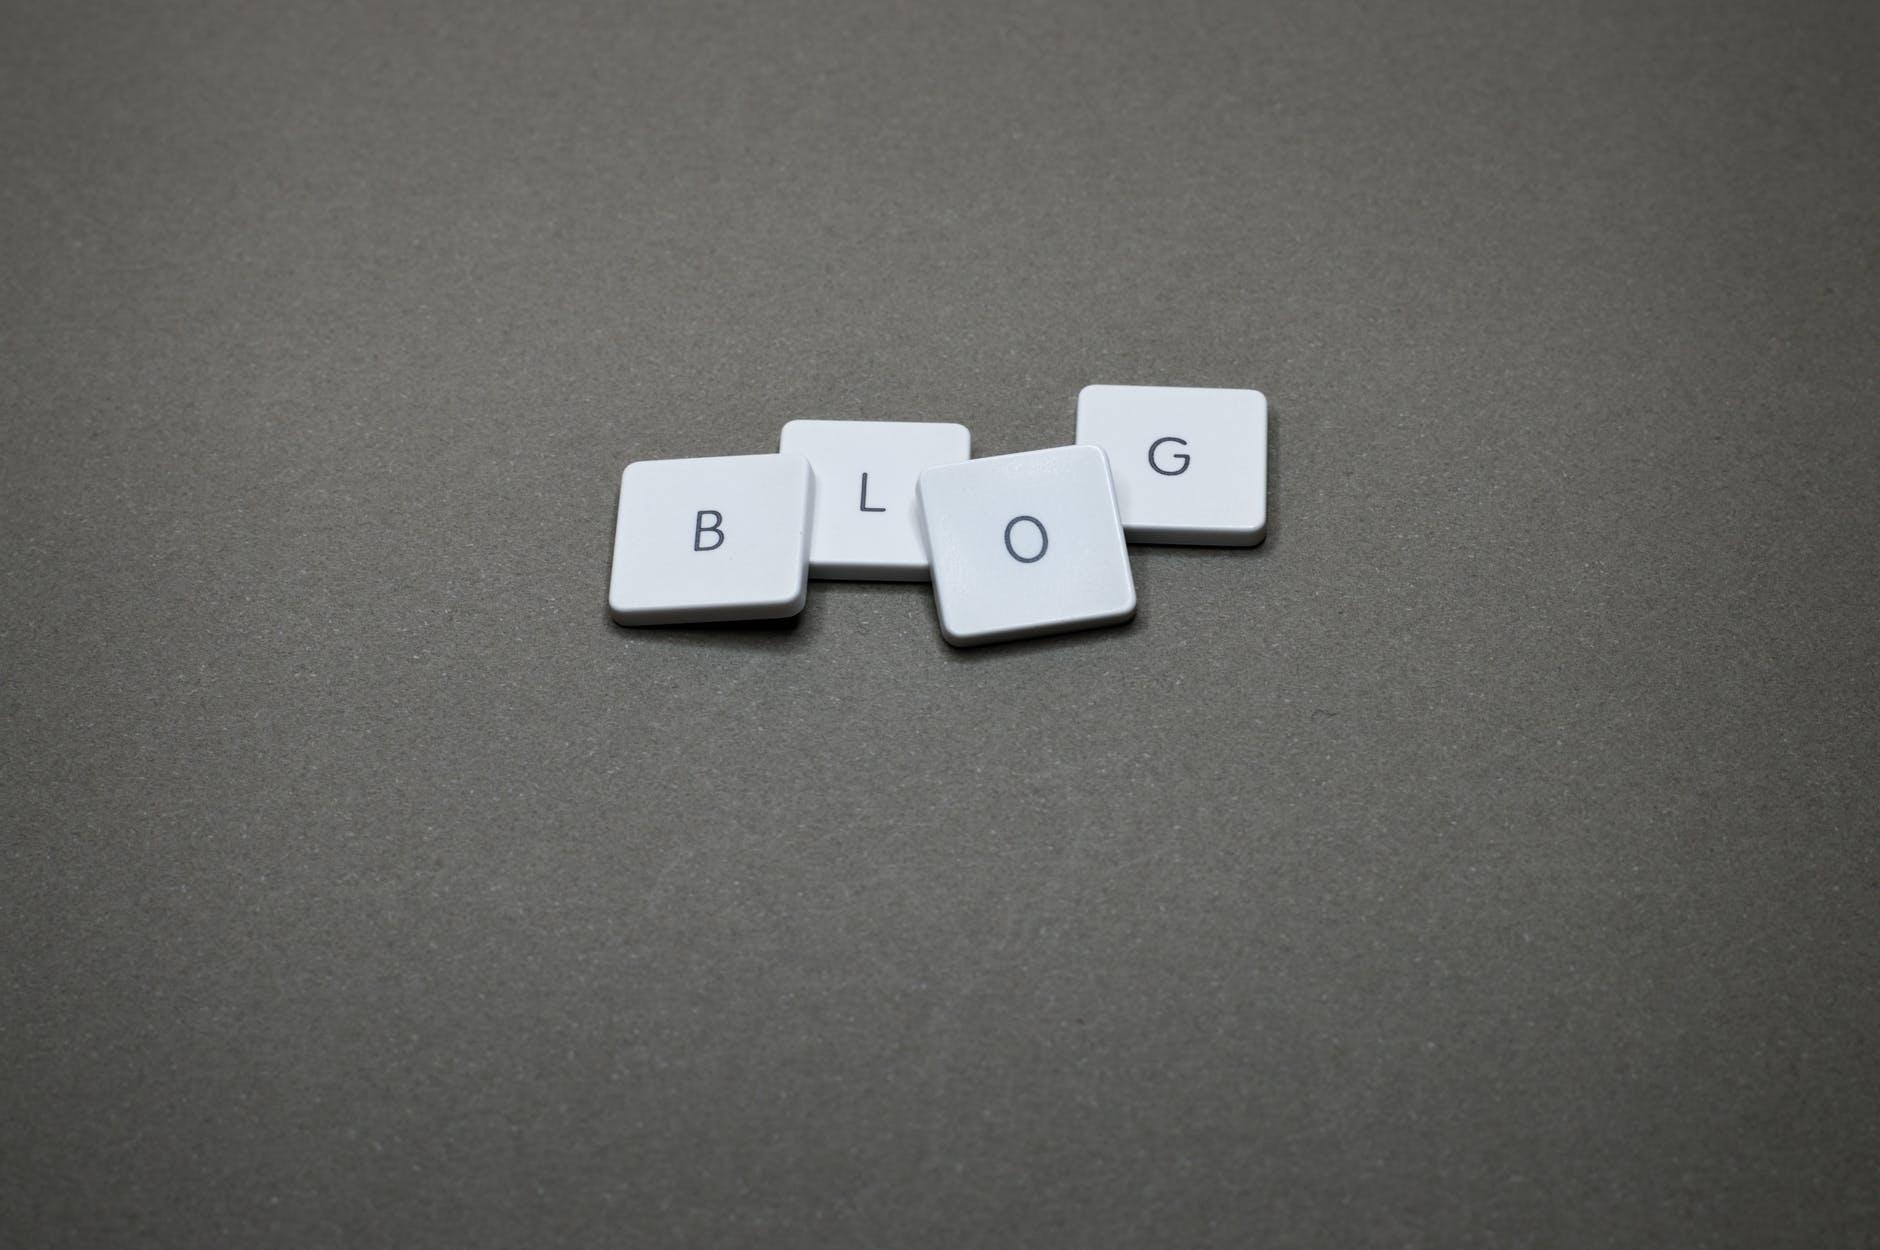 blogging-letter-tiles